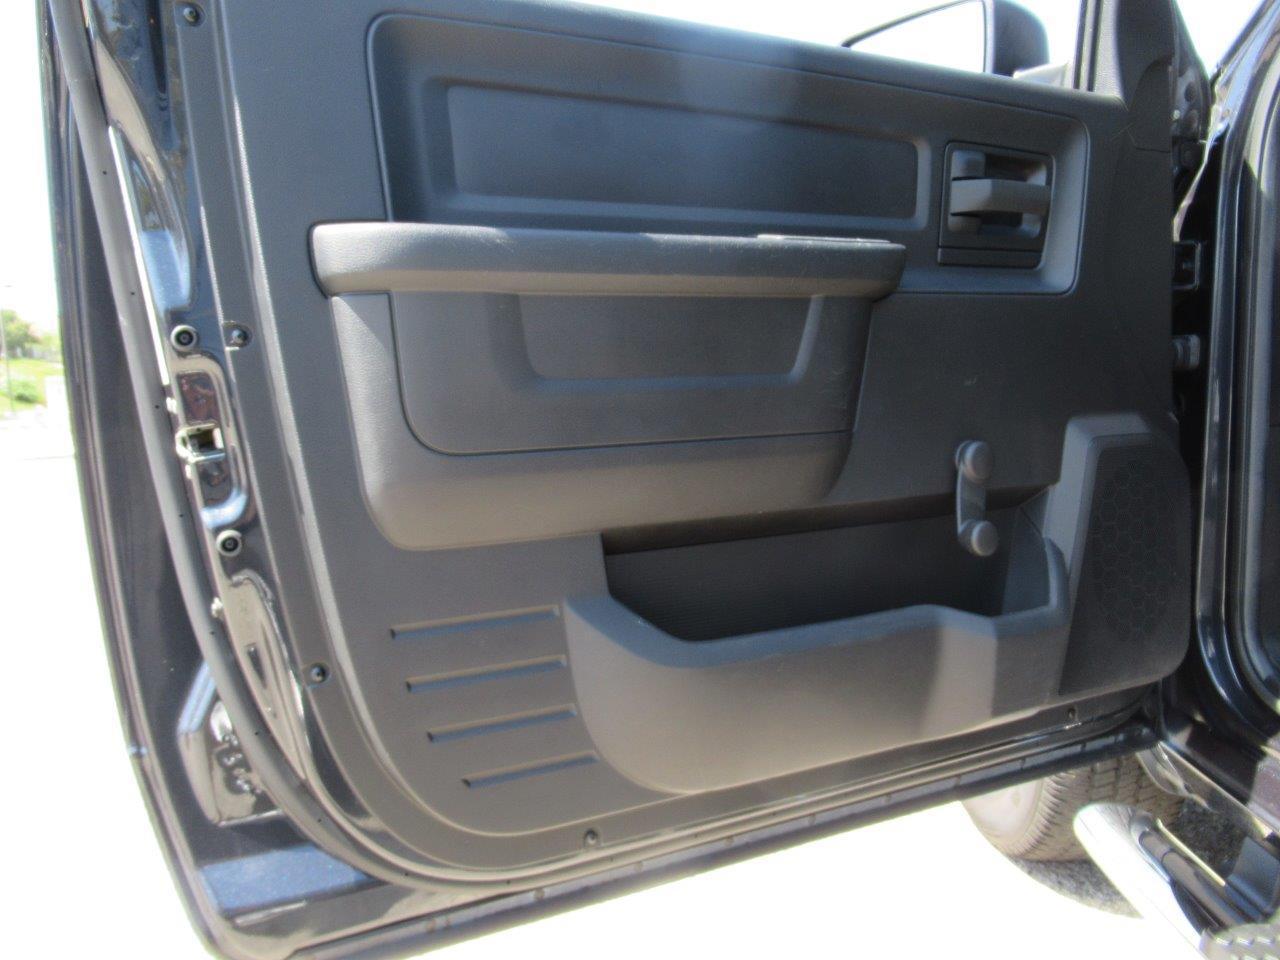 2014 Dodge Ram 1500 (CC-1258071) for sale in SIMI VALLEY, California